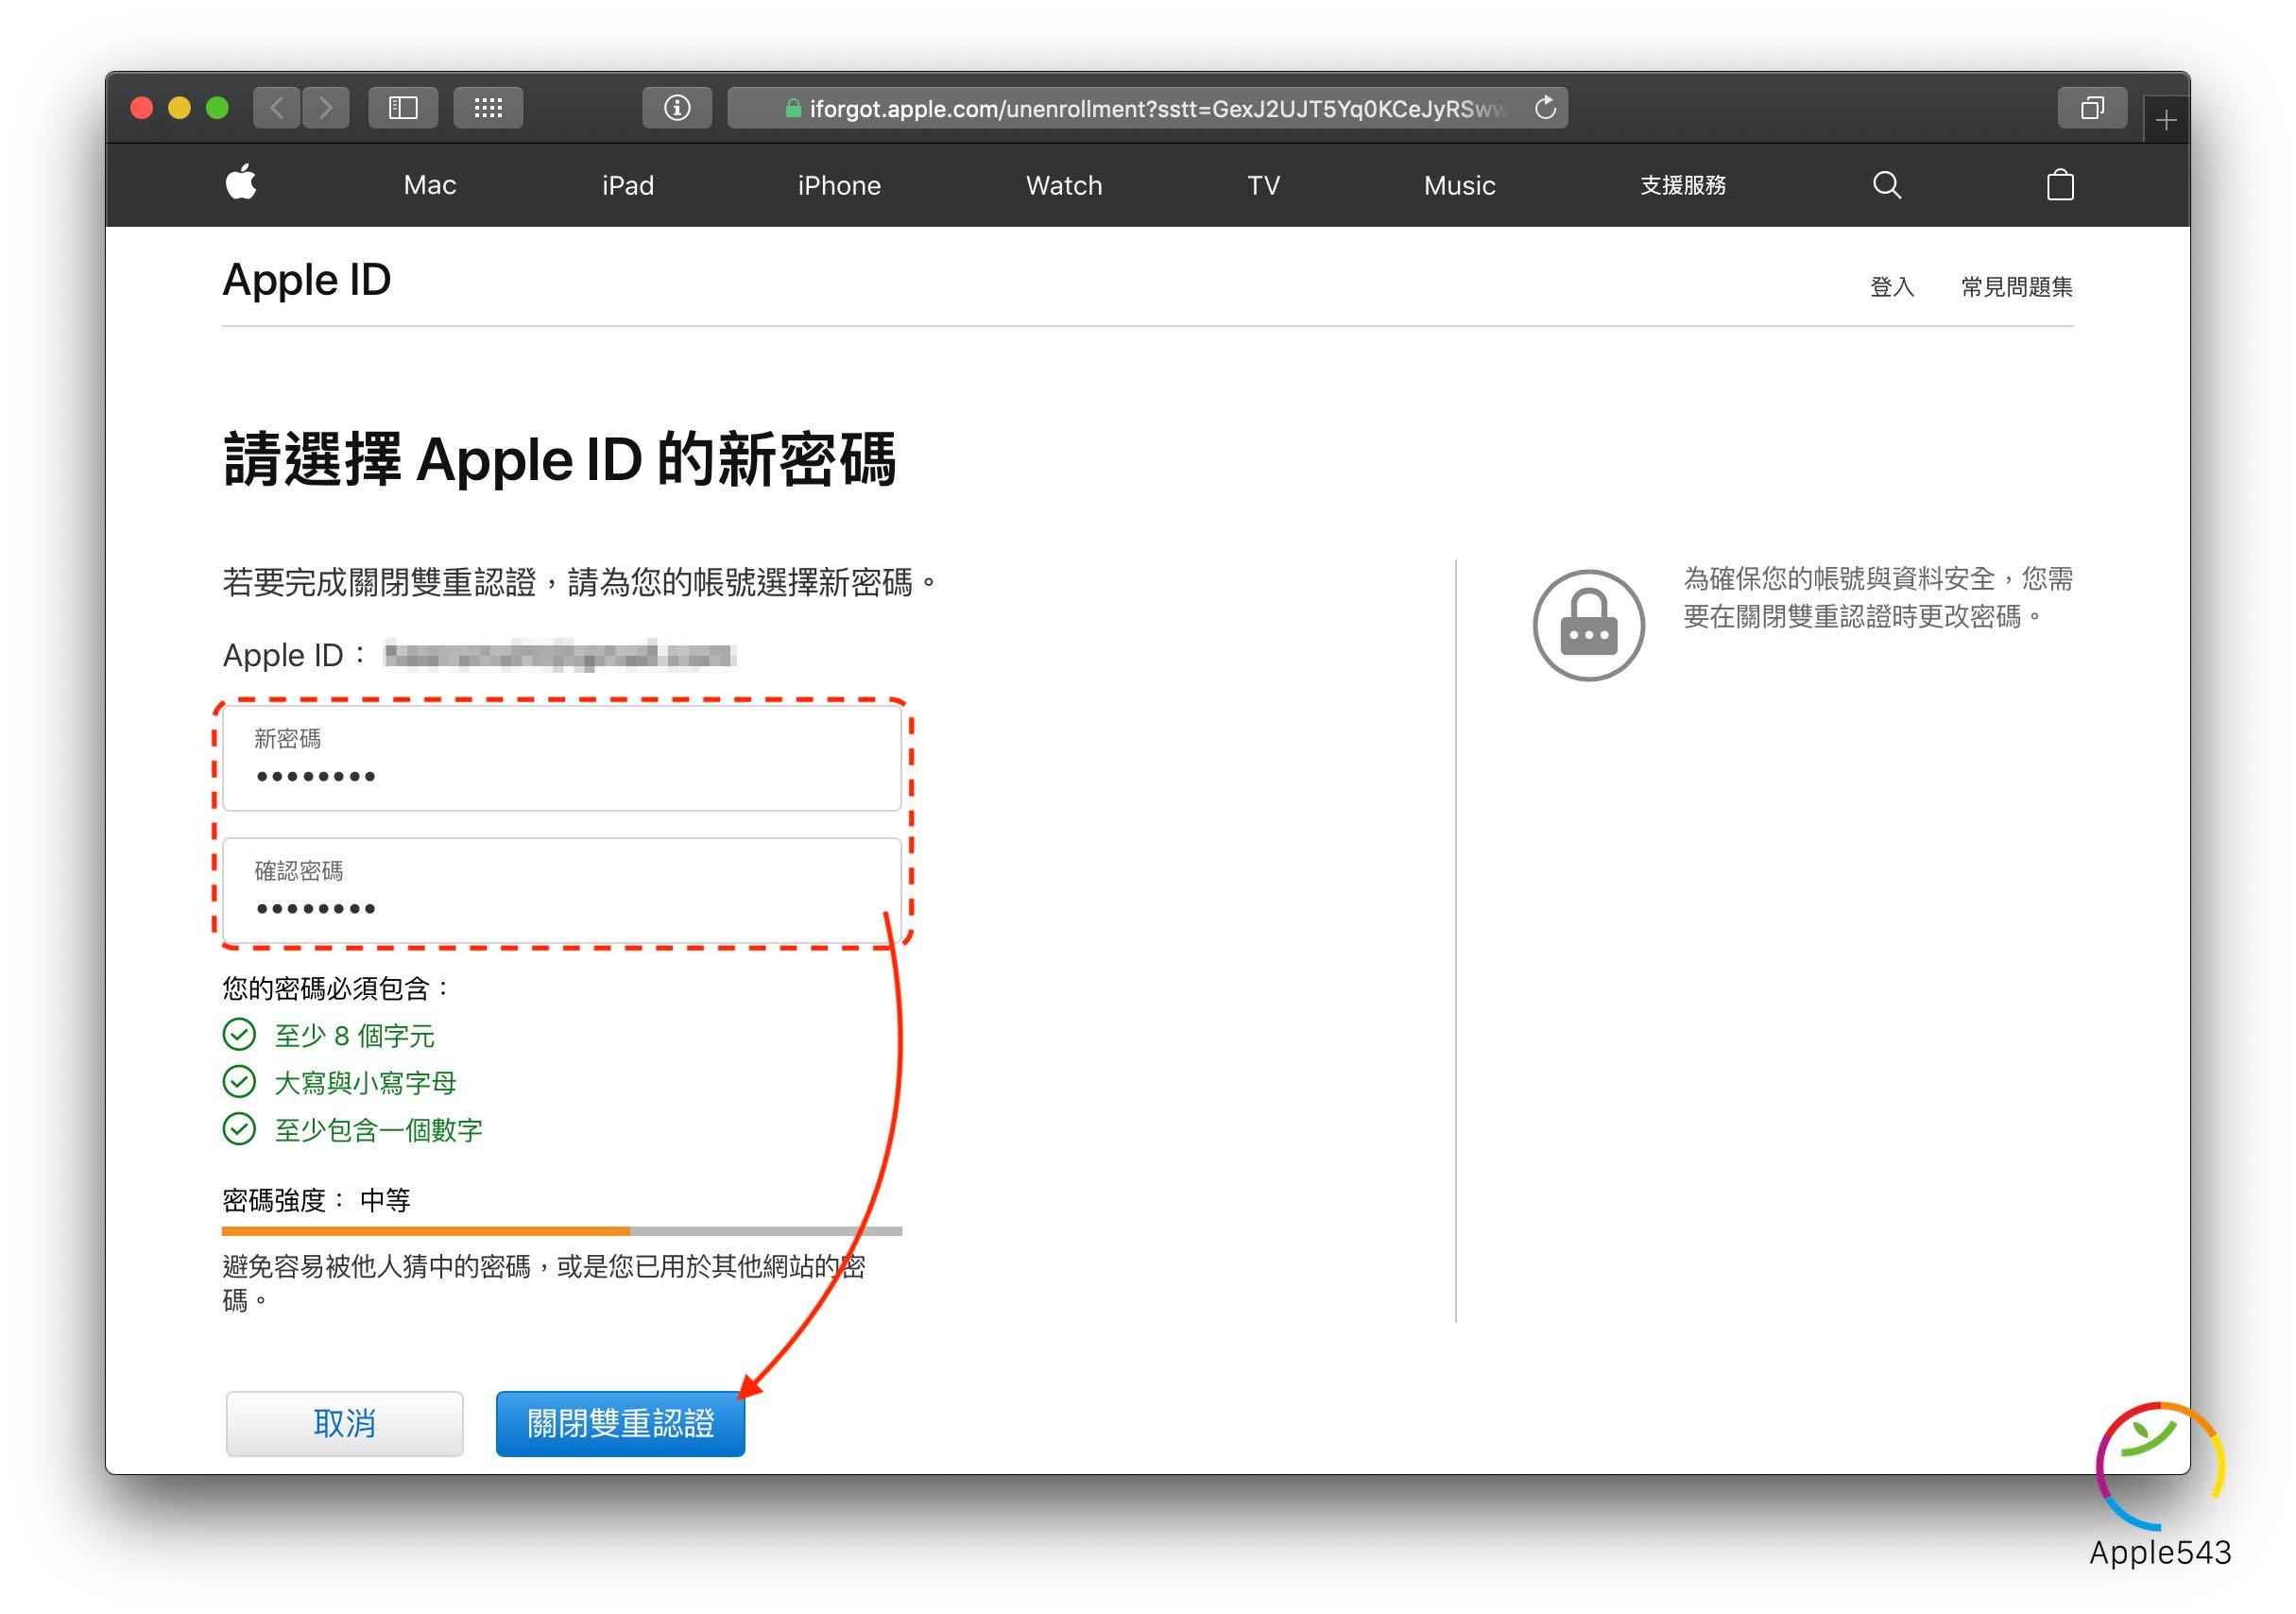 iPhone 雙重認證關閉 方法,後悔打開的現在還有救! - Apple543 找教學